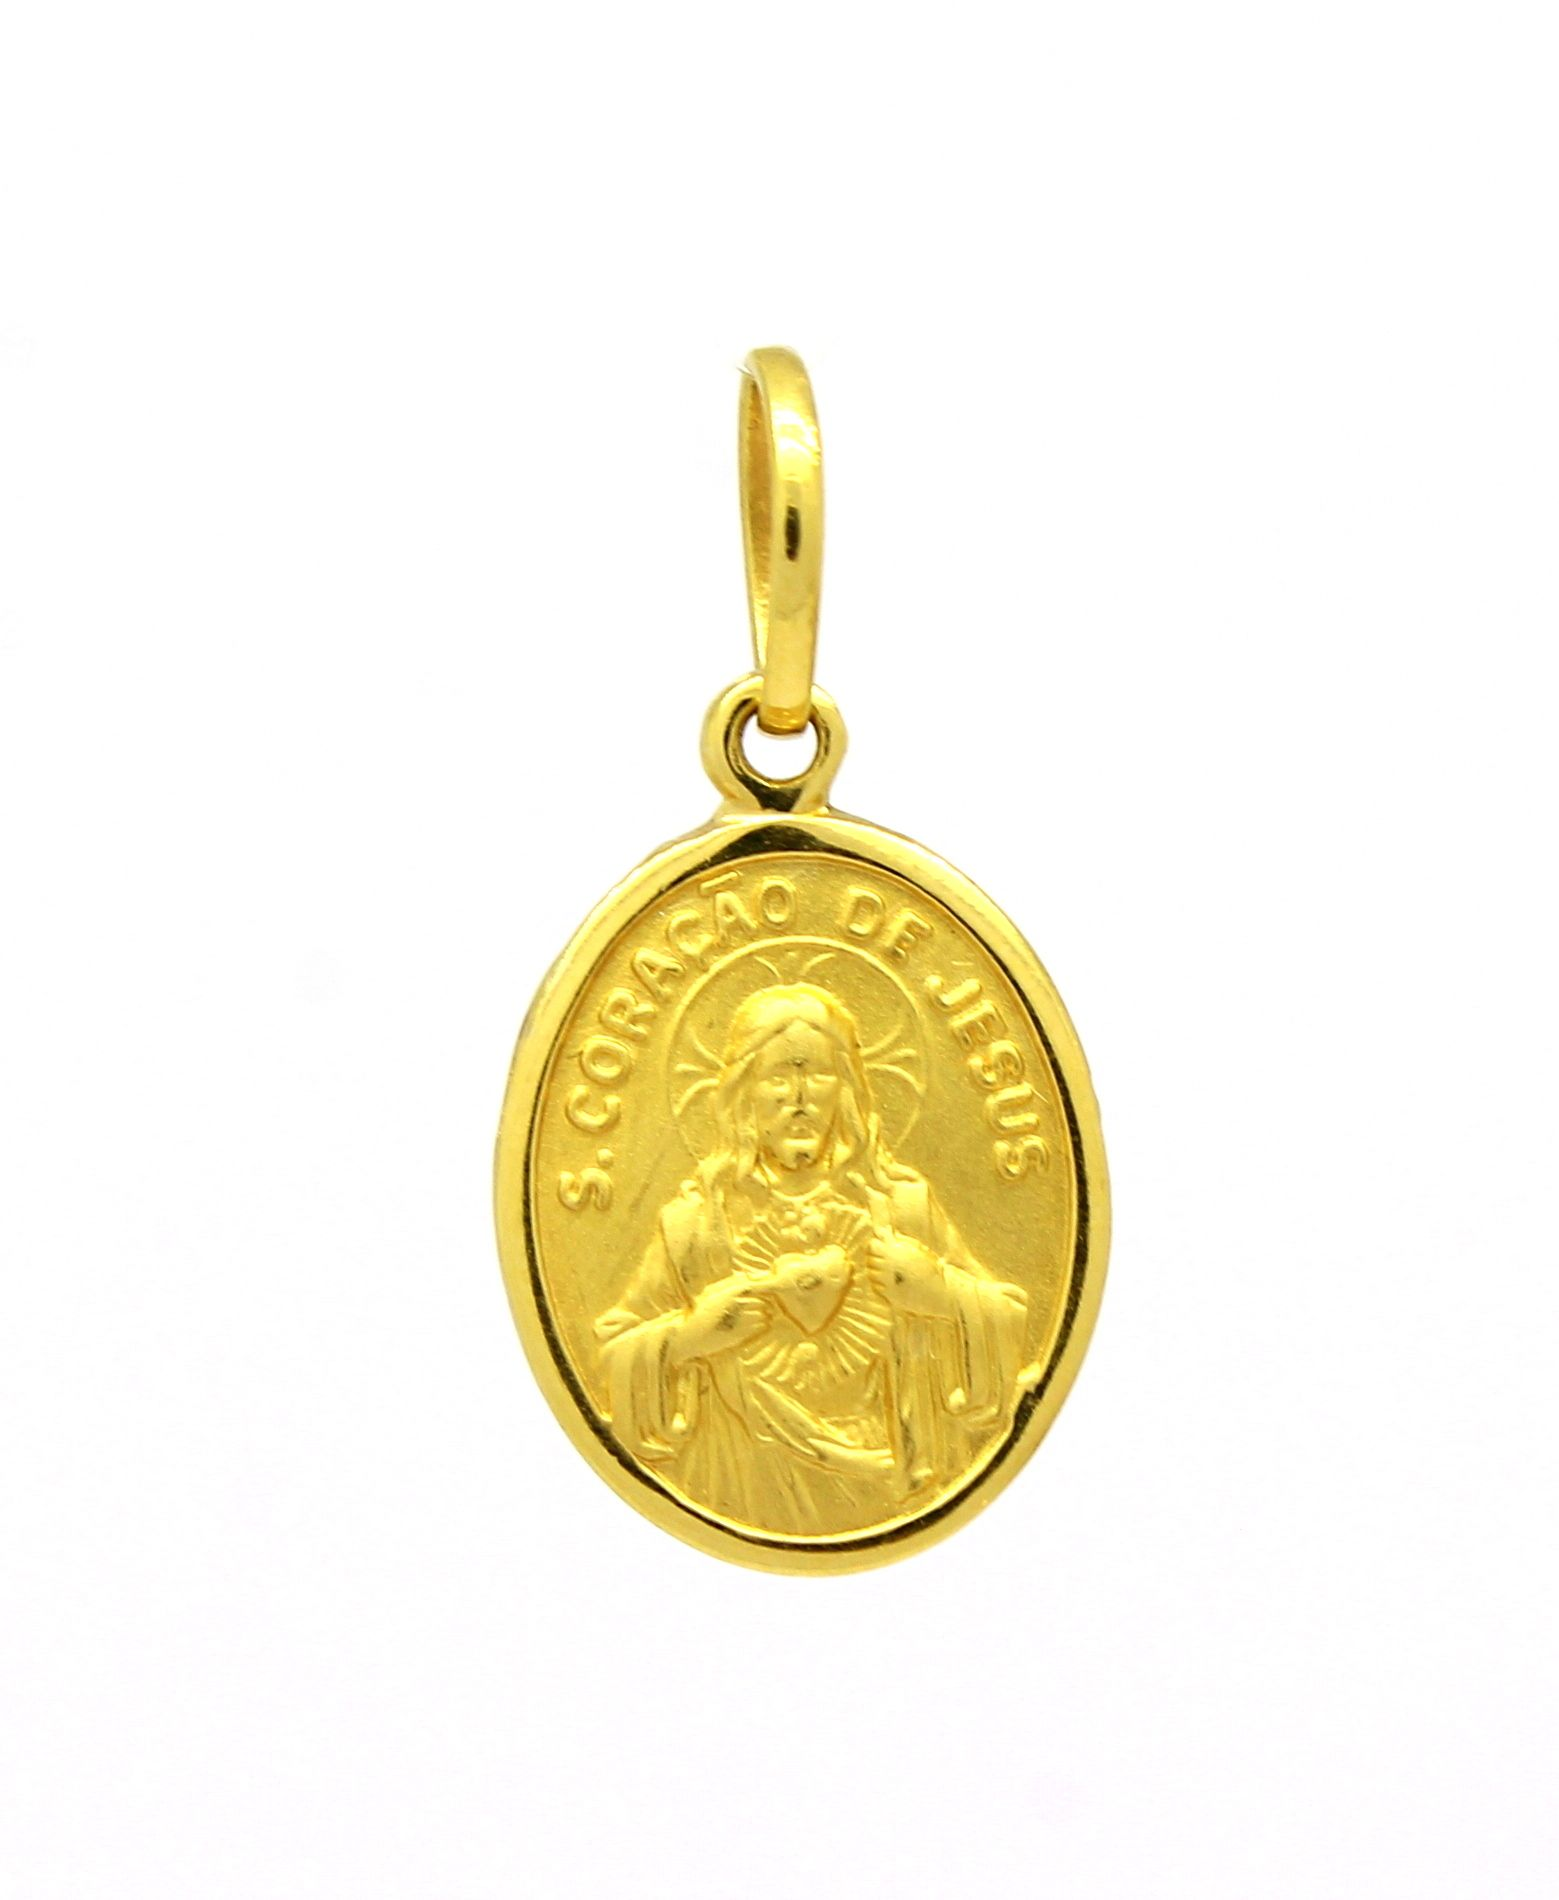 2bc8250c1417b Pingente Menino Jesus de Praga Pequeno Ouro Amarelo 18k 750